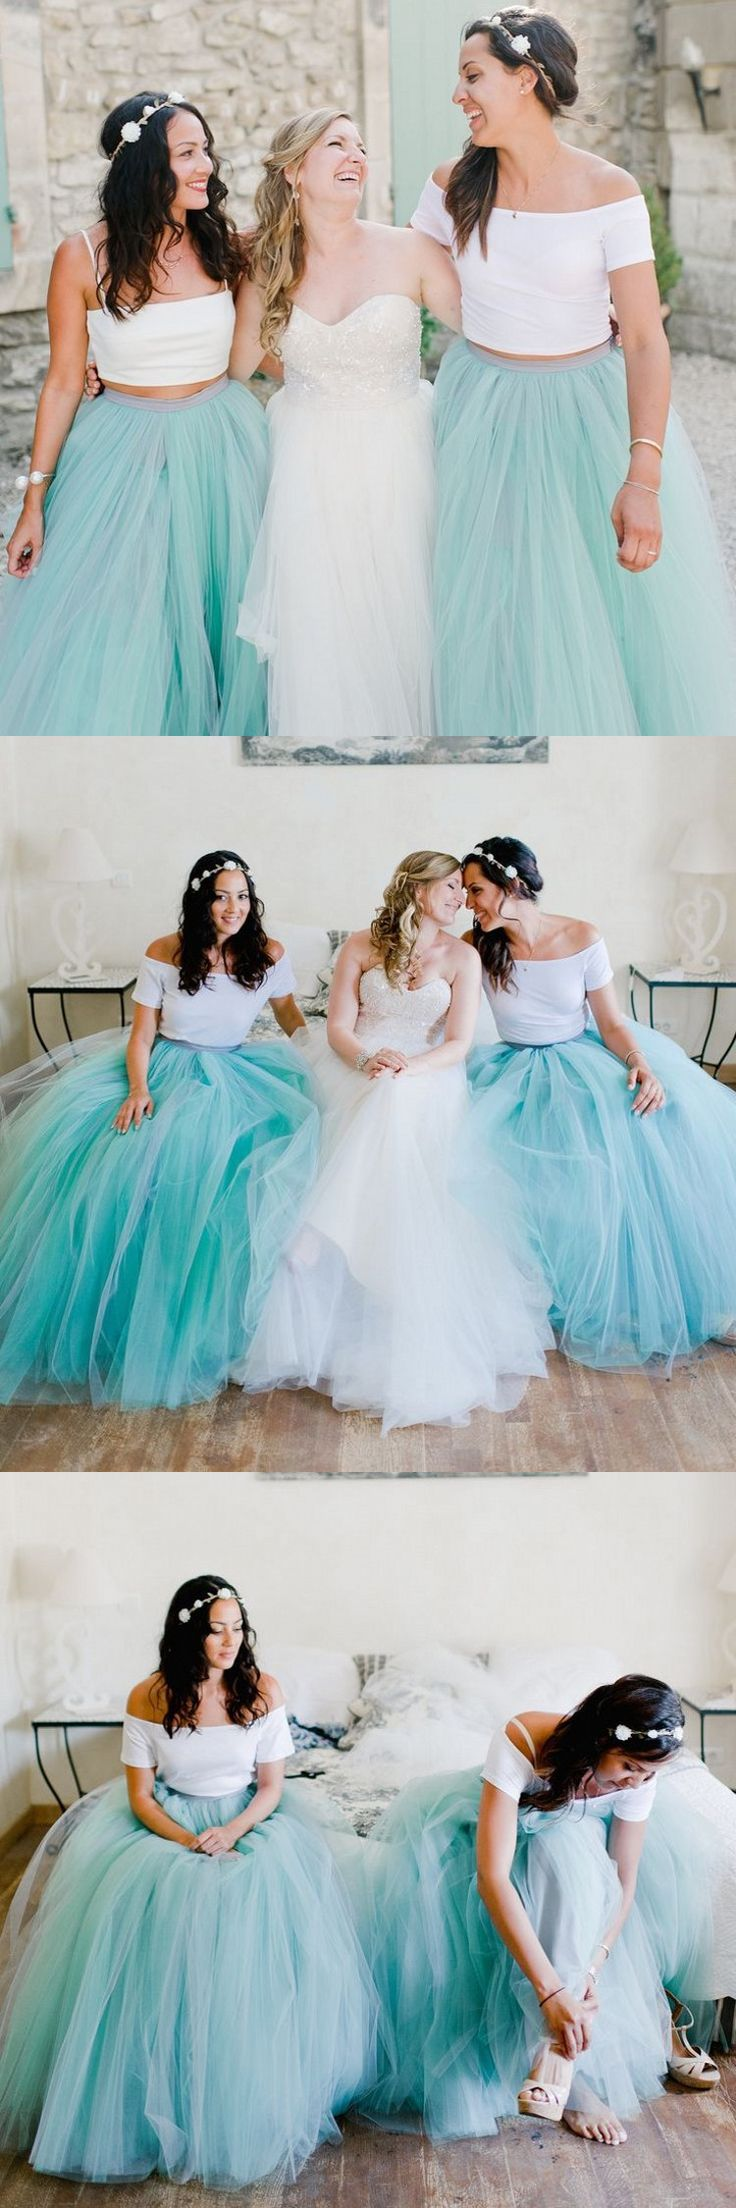 Funky Womens Tutu Party Dress Photos - All Wedding Dresses ...